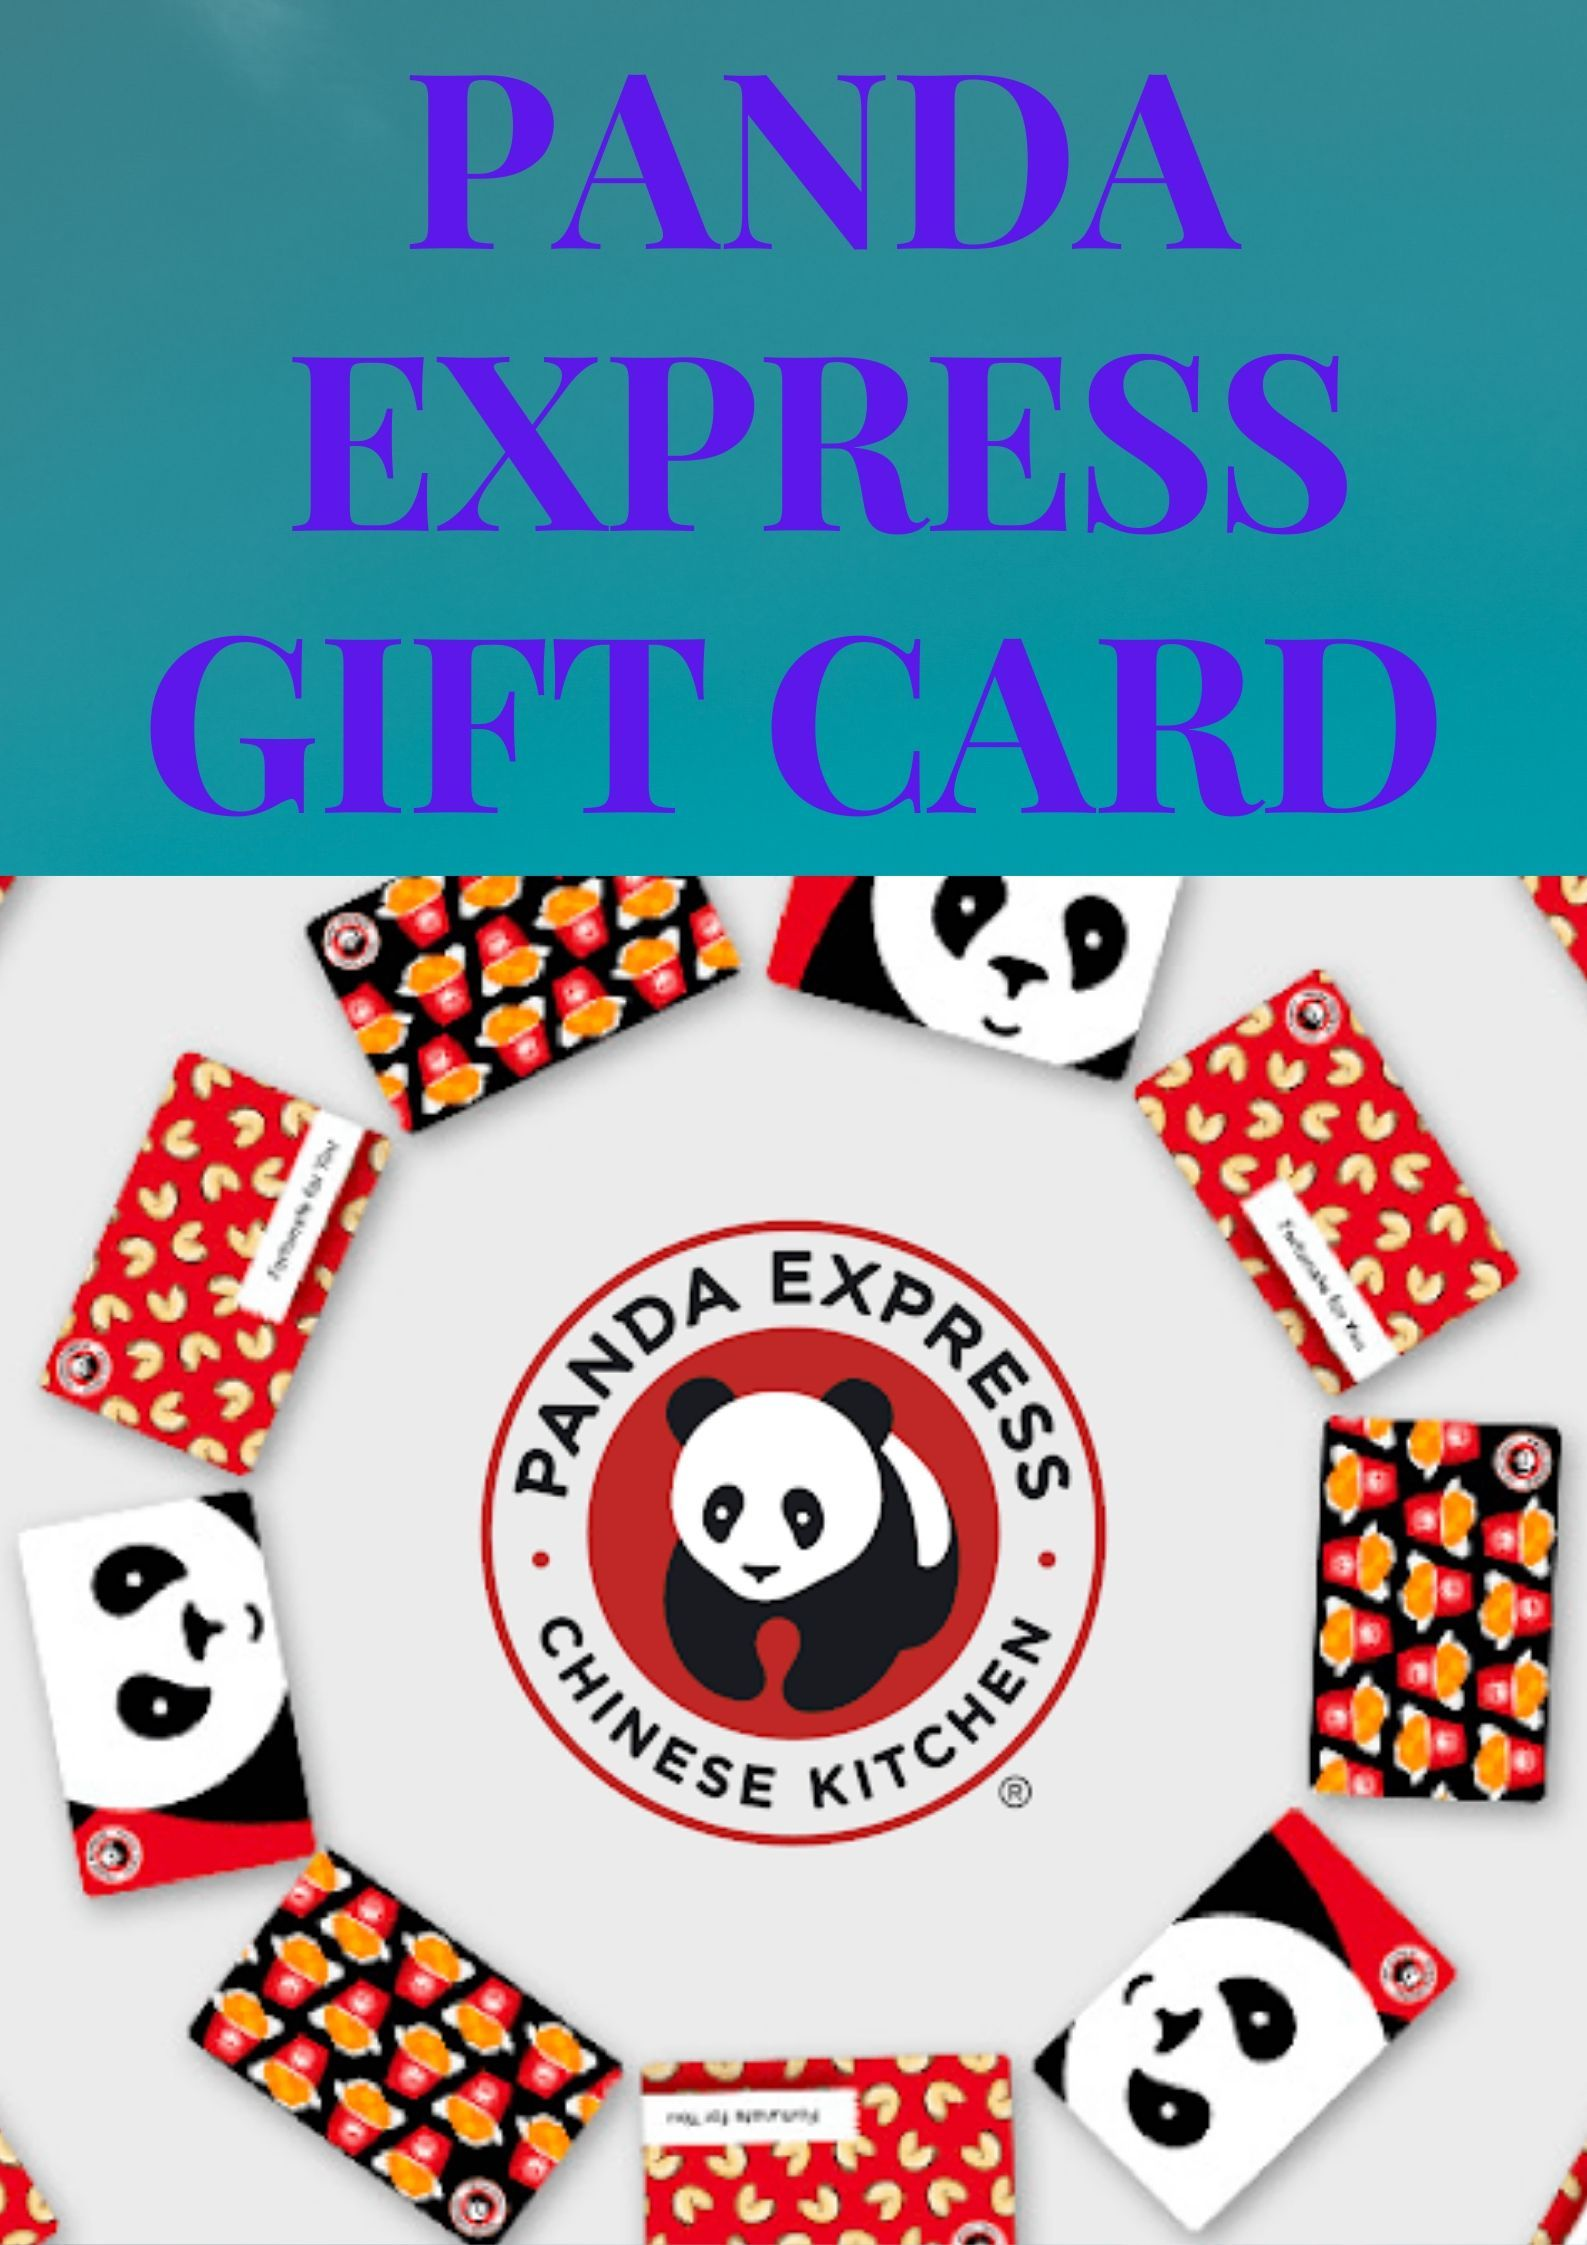 Get a 100 panda express gift card enjoy delicious and